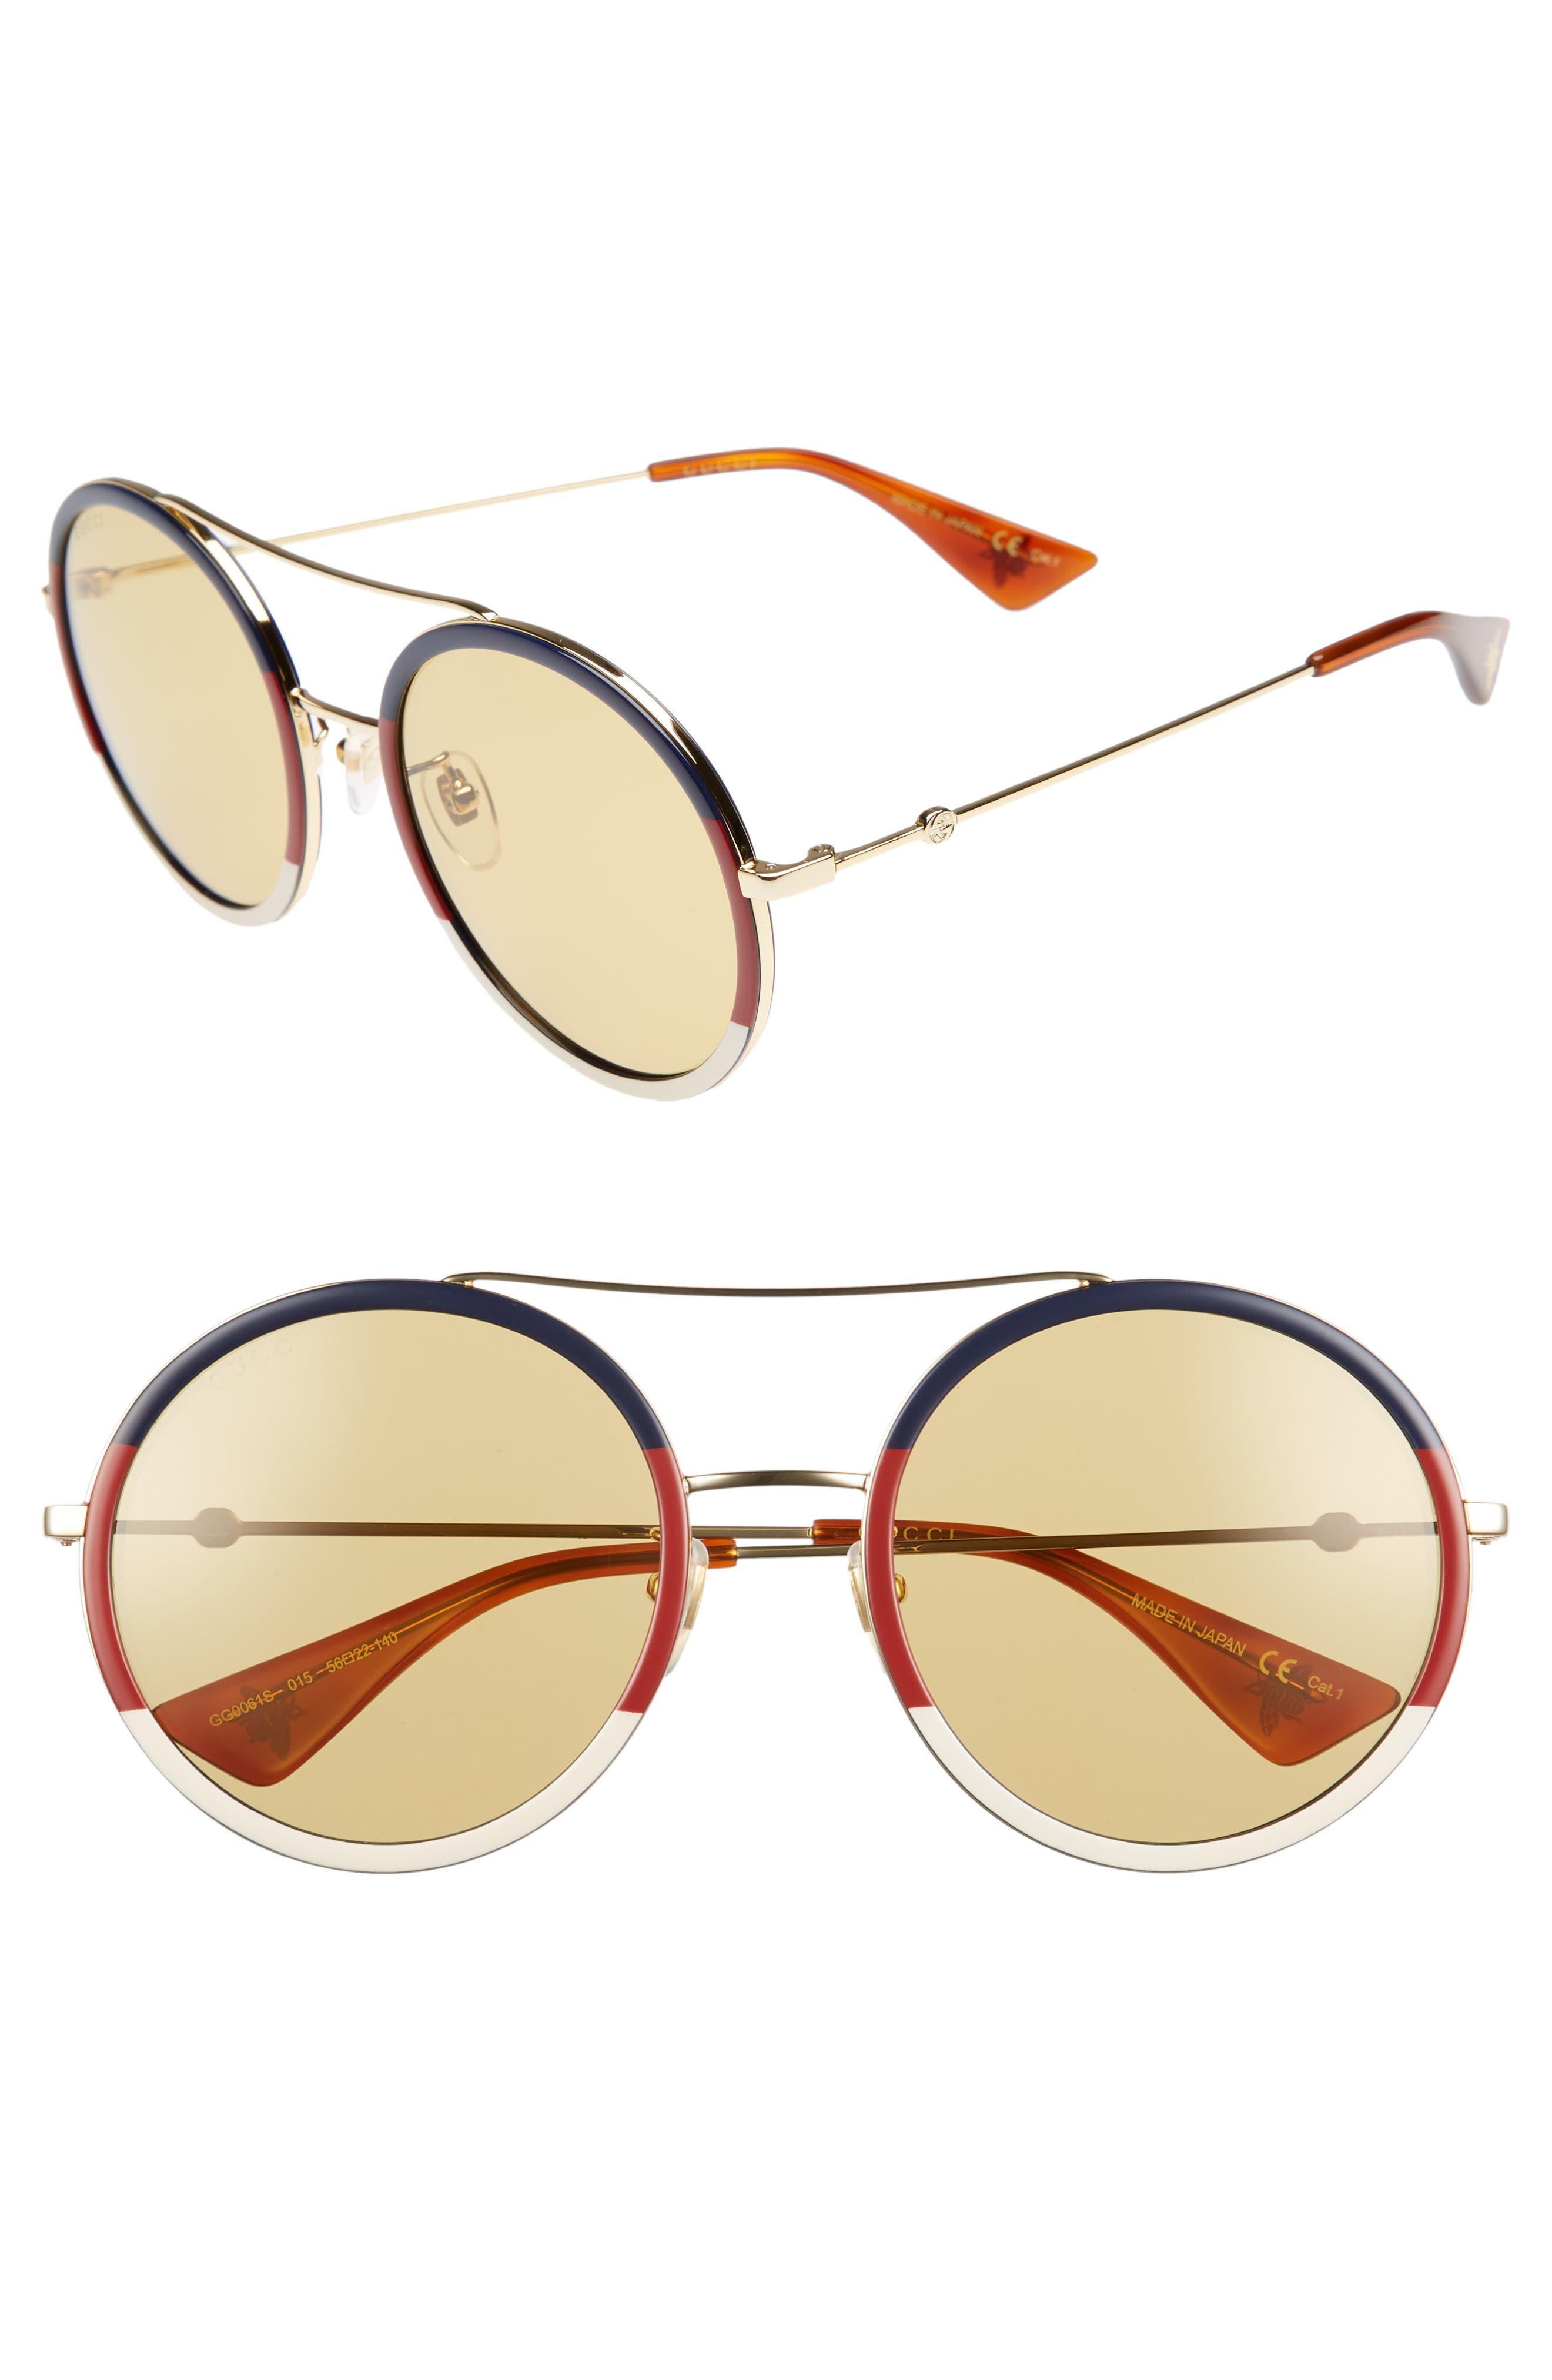 56mm Round Sunglasses,                             Main thumbnail 1, color,                             GOLD/ BLONDE HAVANA